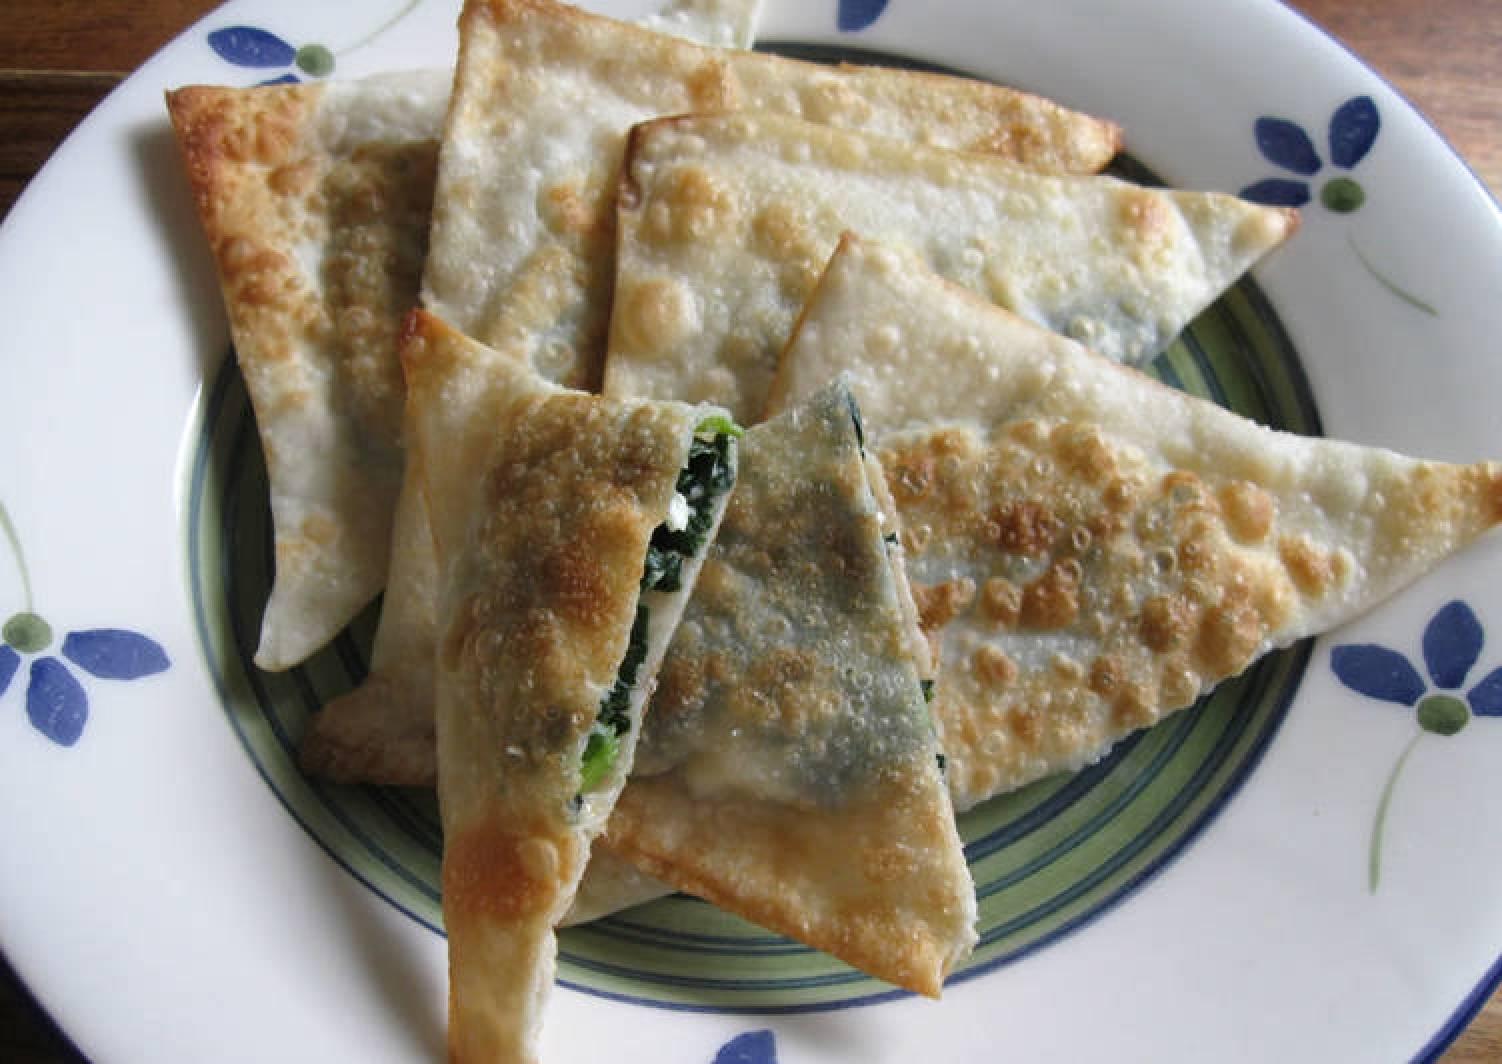 Wonton Skin Spinach & Feta Triangles